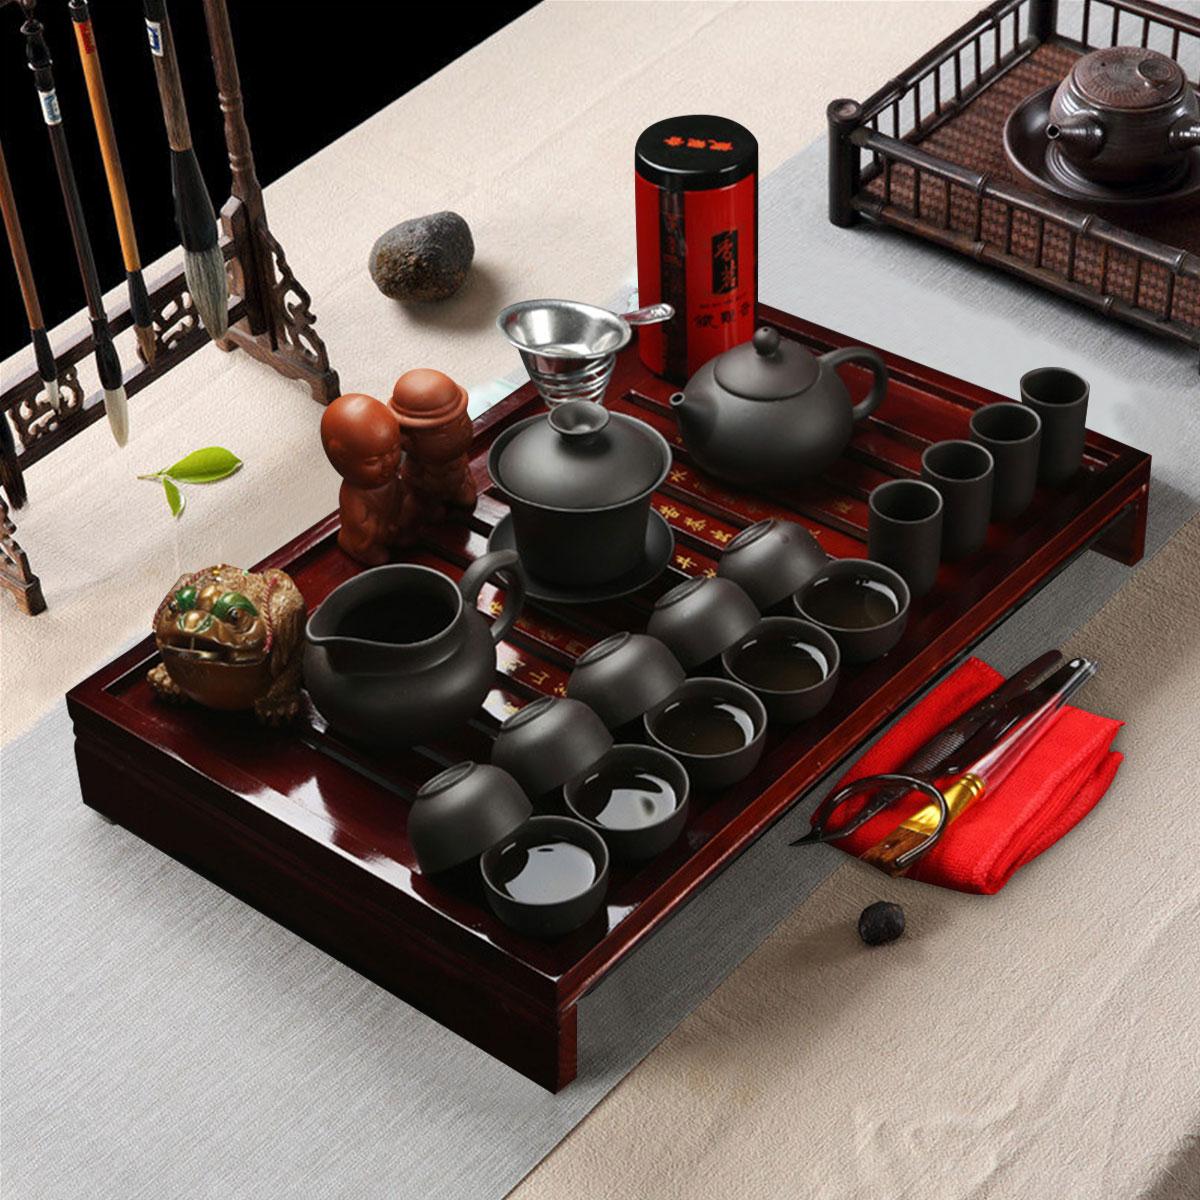 Chinese Kung Fu Tea Making Tools Tea Set Porcelain Teapot Pot Cup Elegant Kettle Wood Holder Tray